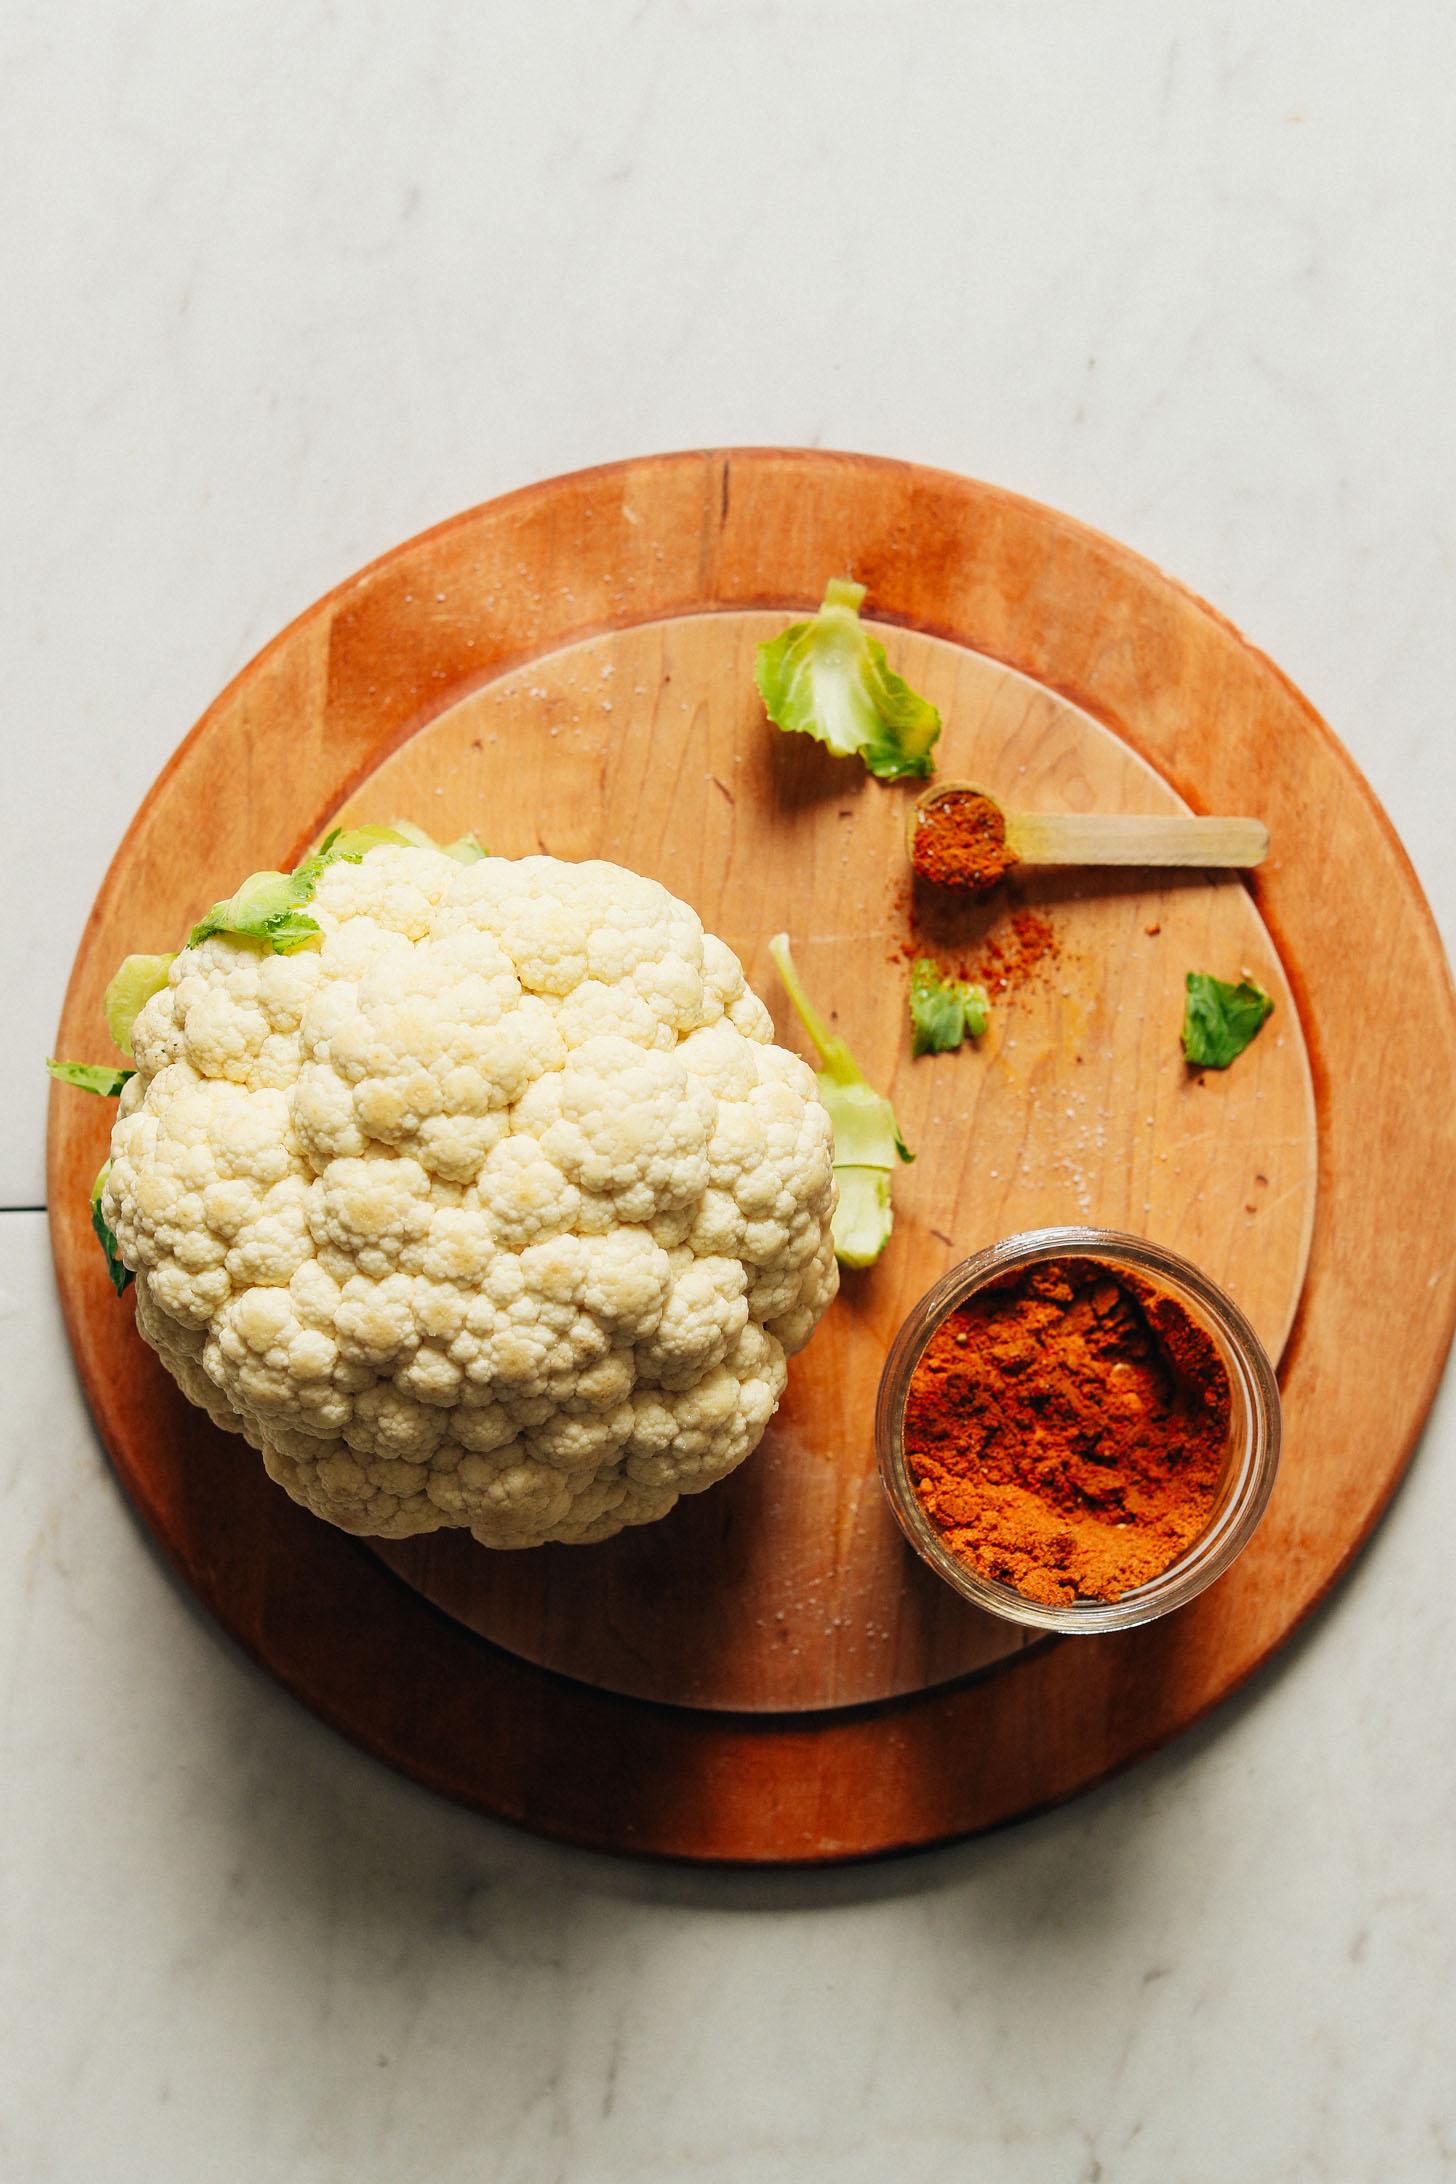 Wood cutting board with cauliflower and homemade Shawarma spice